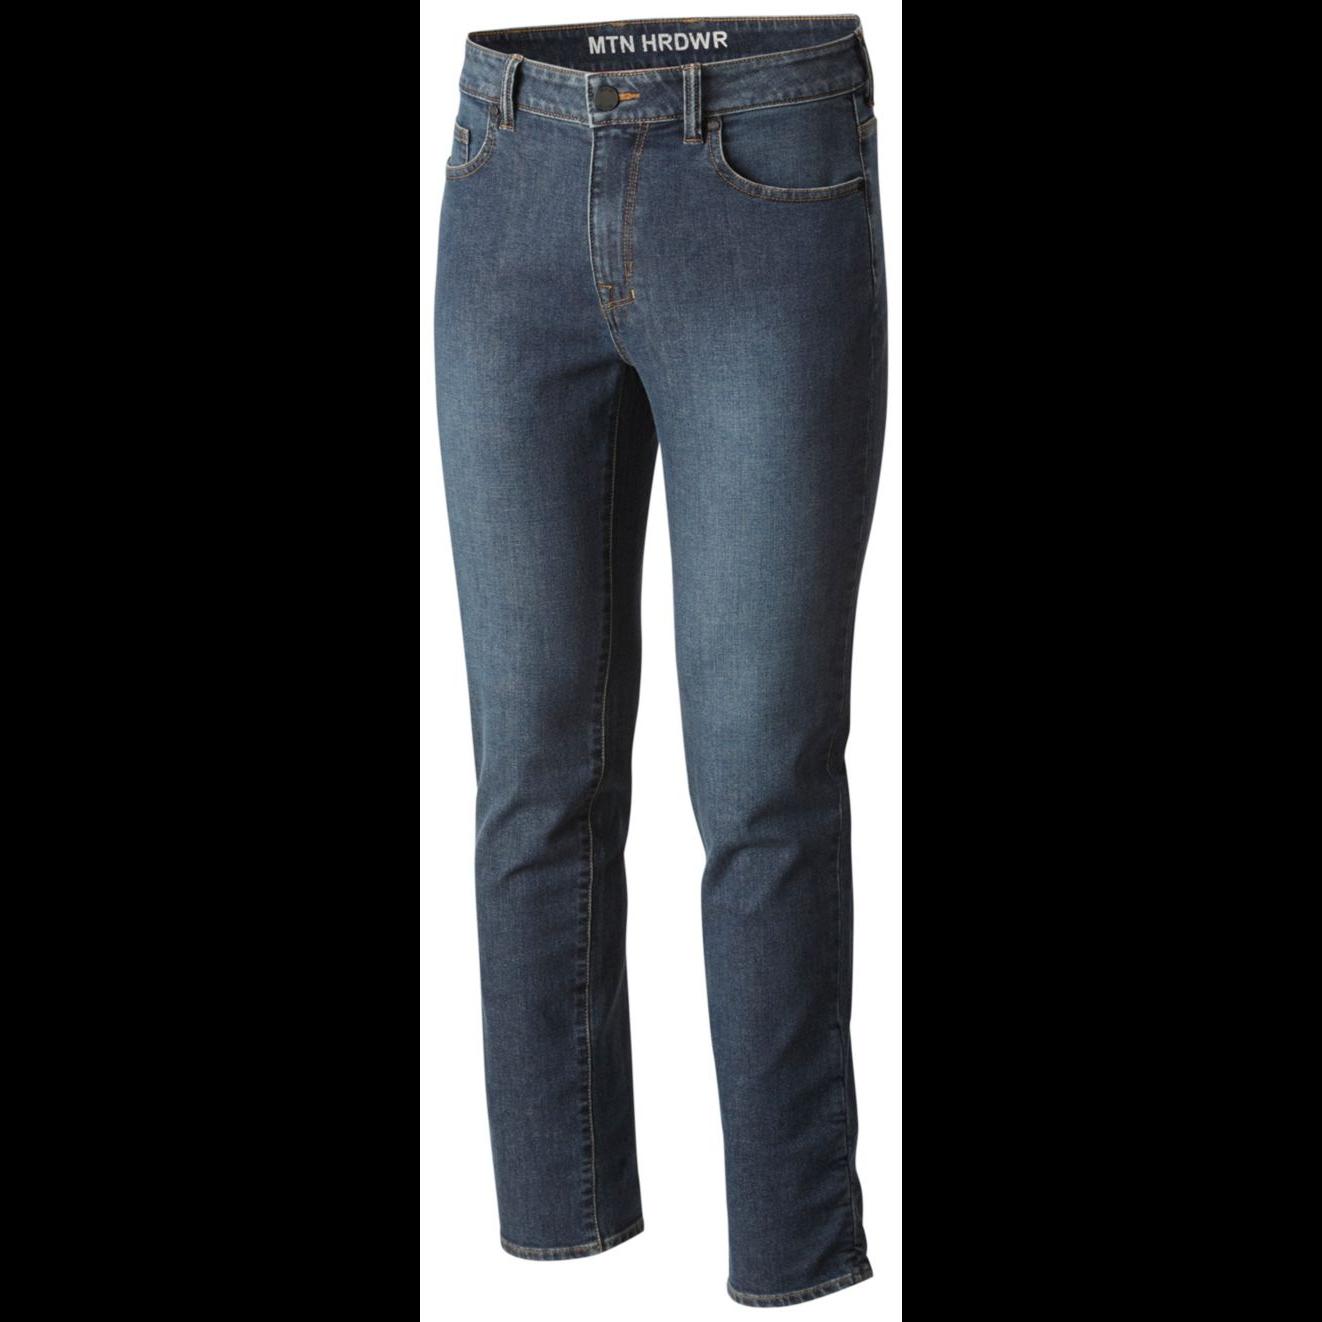 MH Mens Hardwear Denim Jean